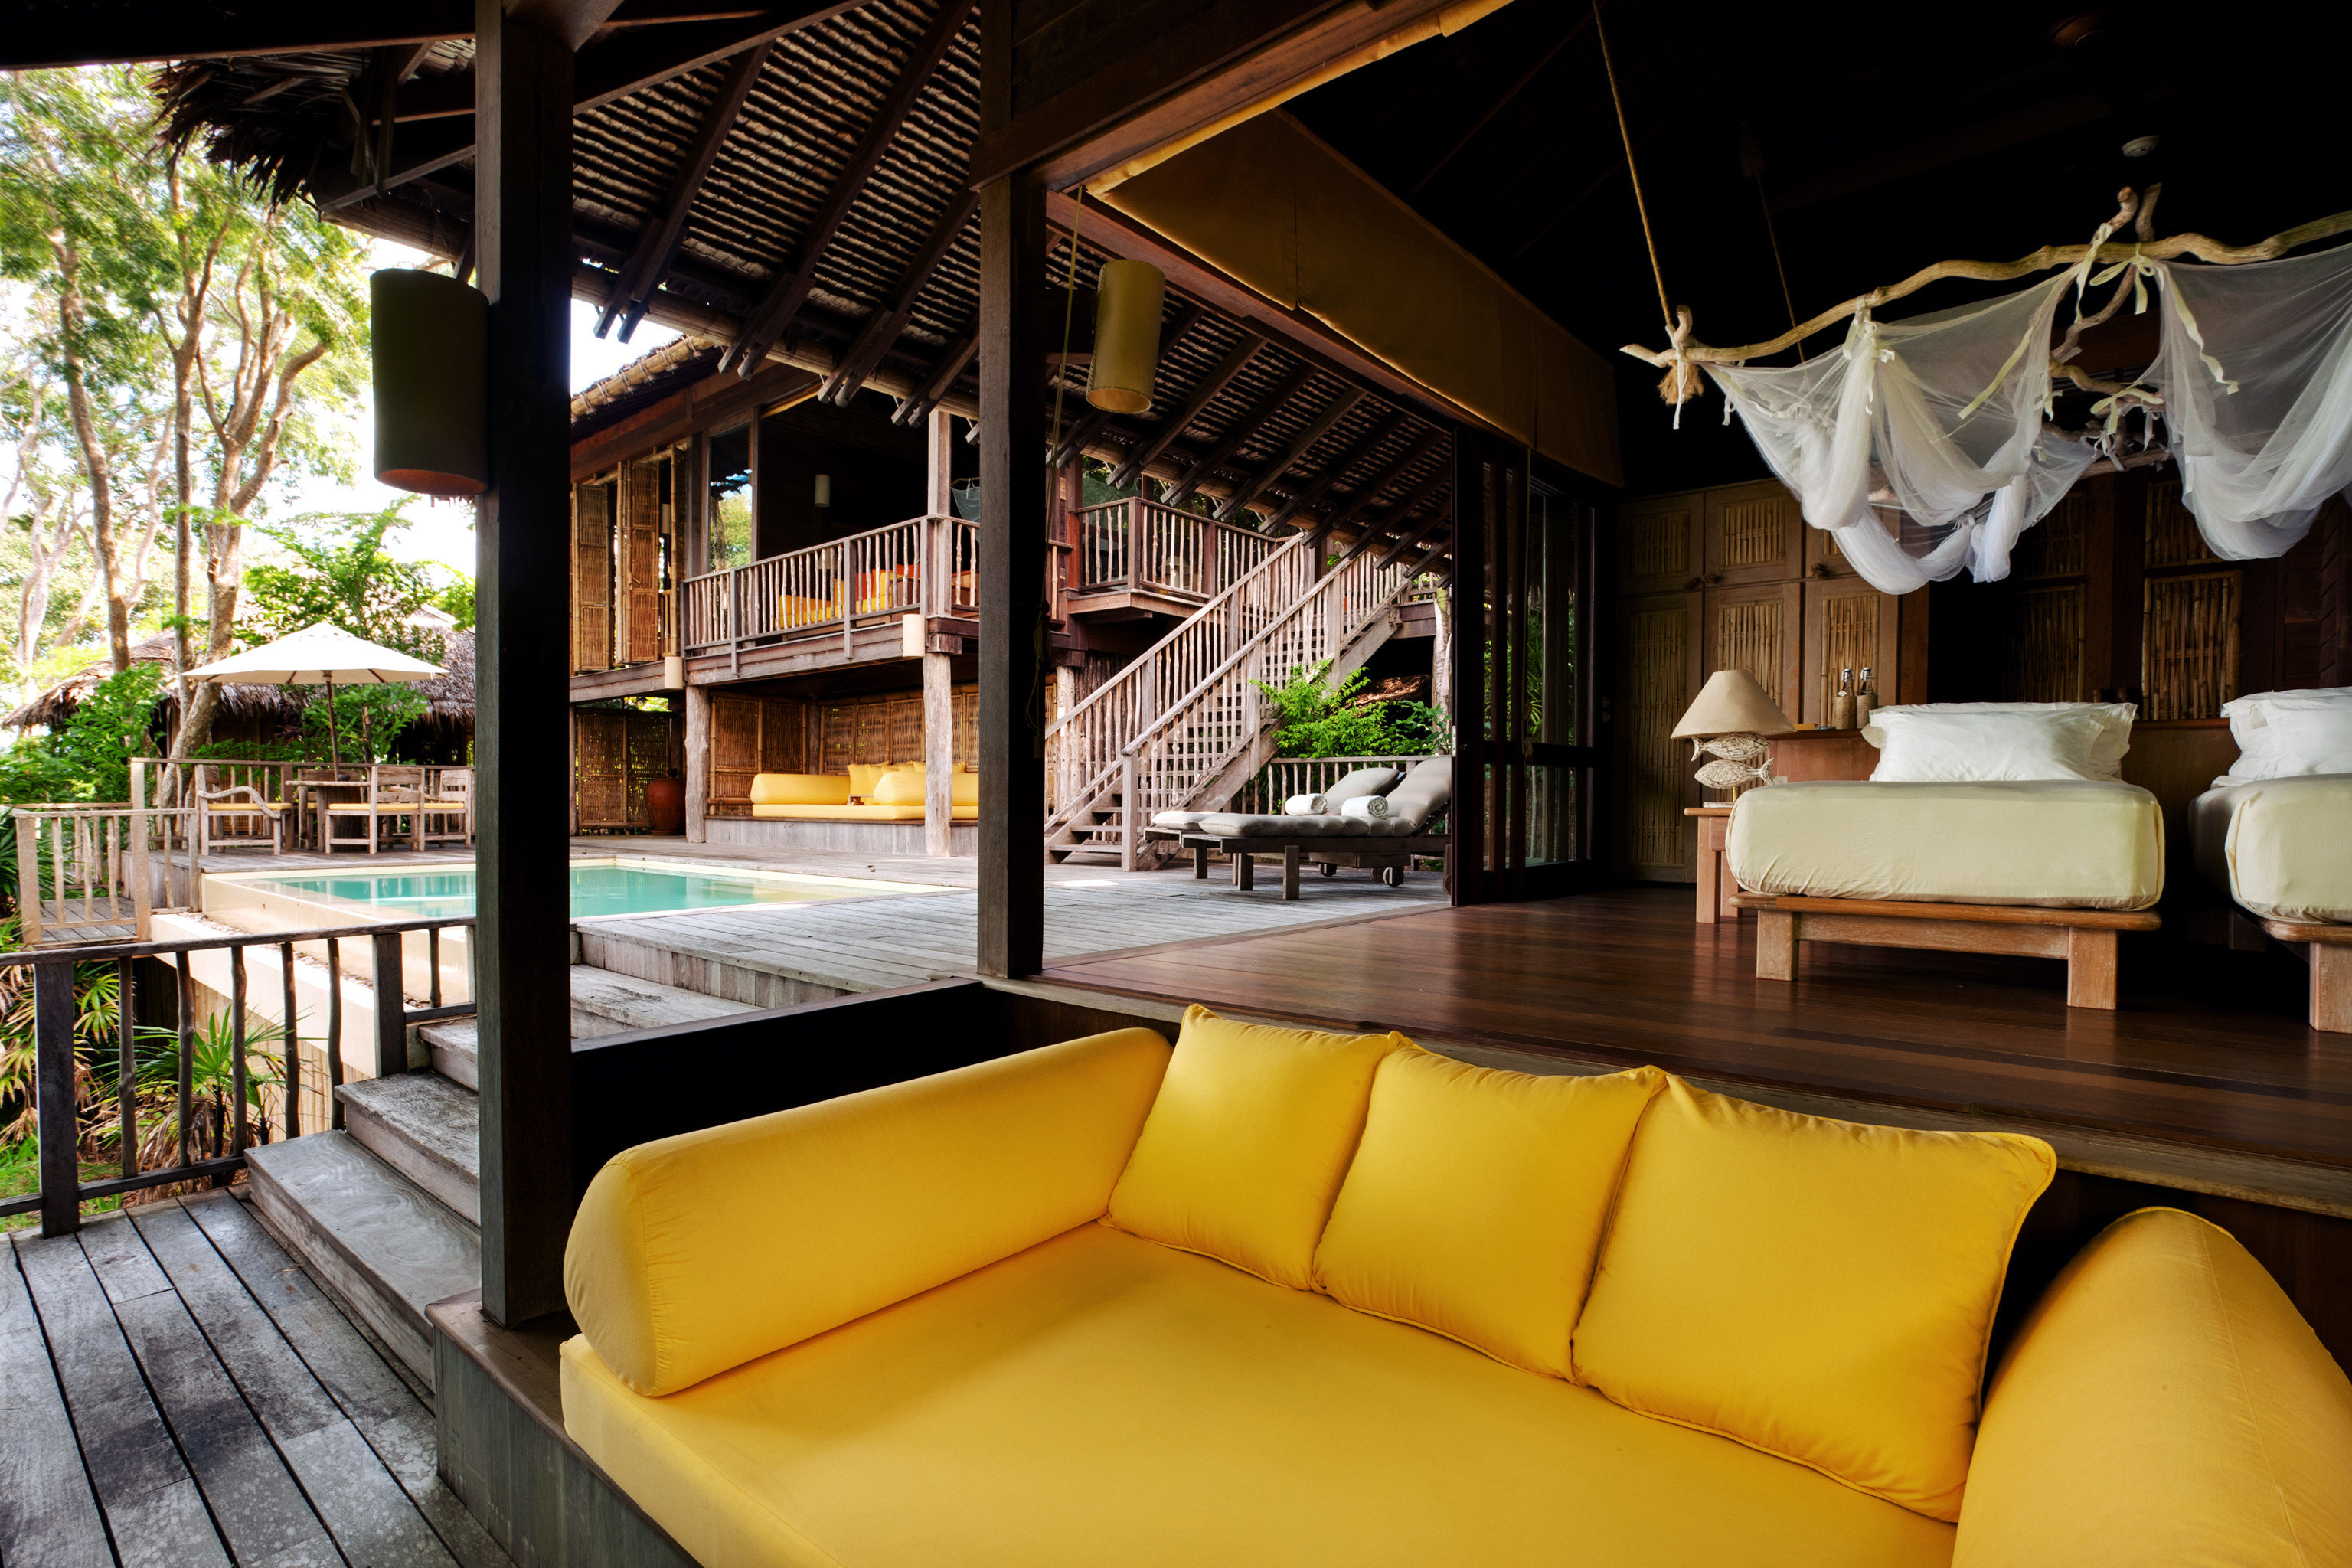 Beach Fitness Hotels Living Lounge Phuket Pool Thailand indoor property Resort room estate Villa vacation interior design eco hotel real estate hacienda mansion area furniture